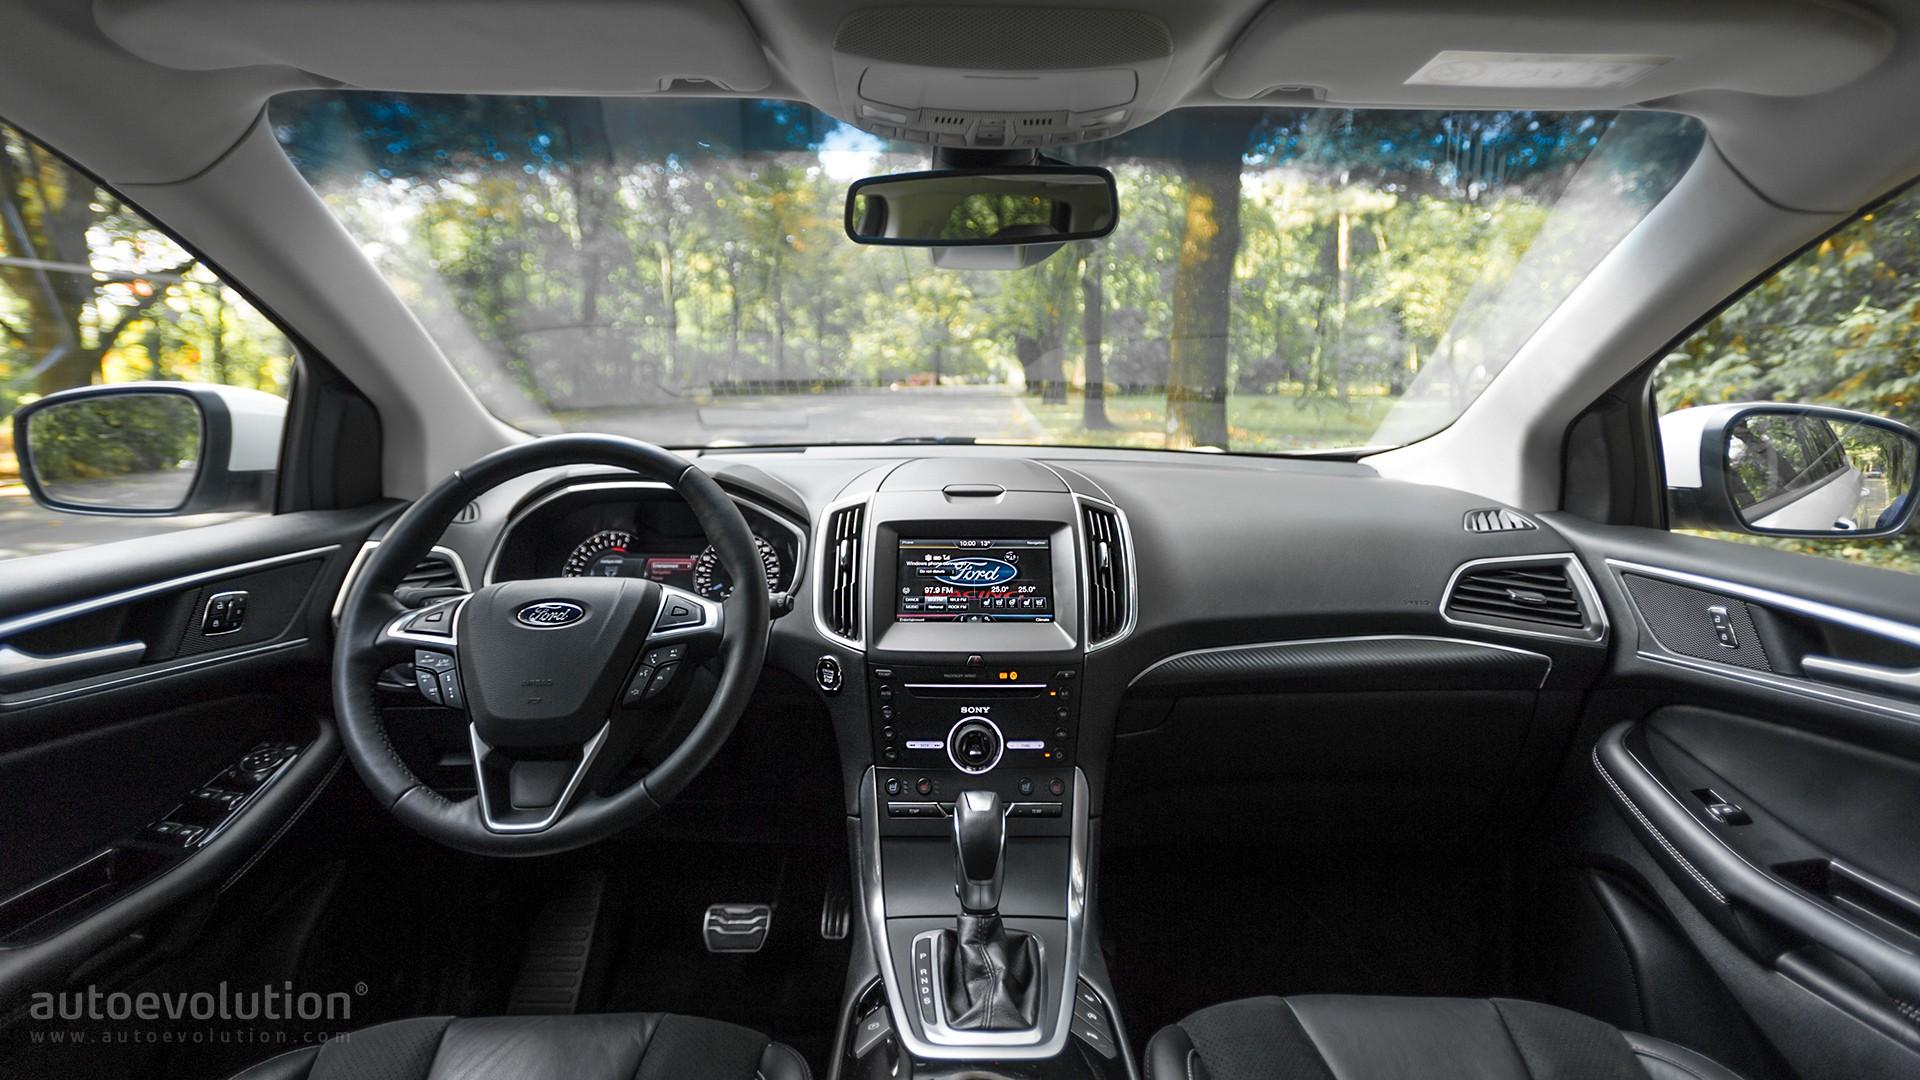 Driven 2016 Ford Edge 2 0 TDCi Bi Turbo 4x4 PowerShift Interior